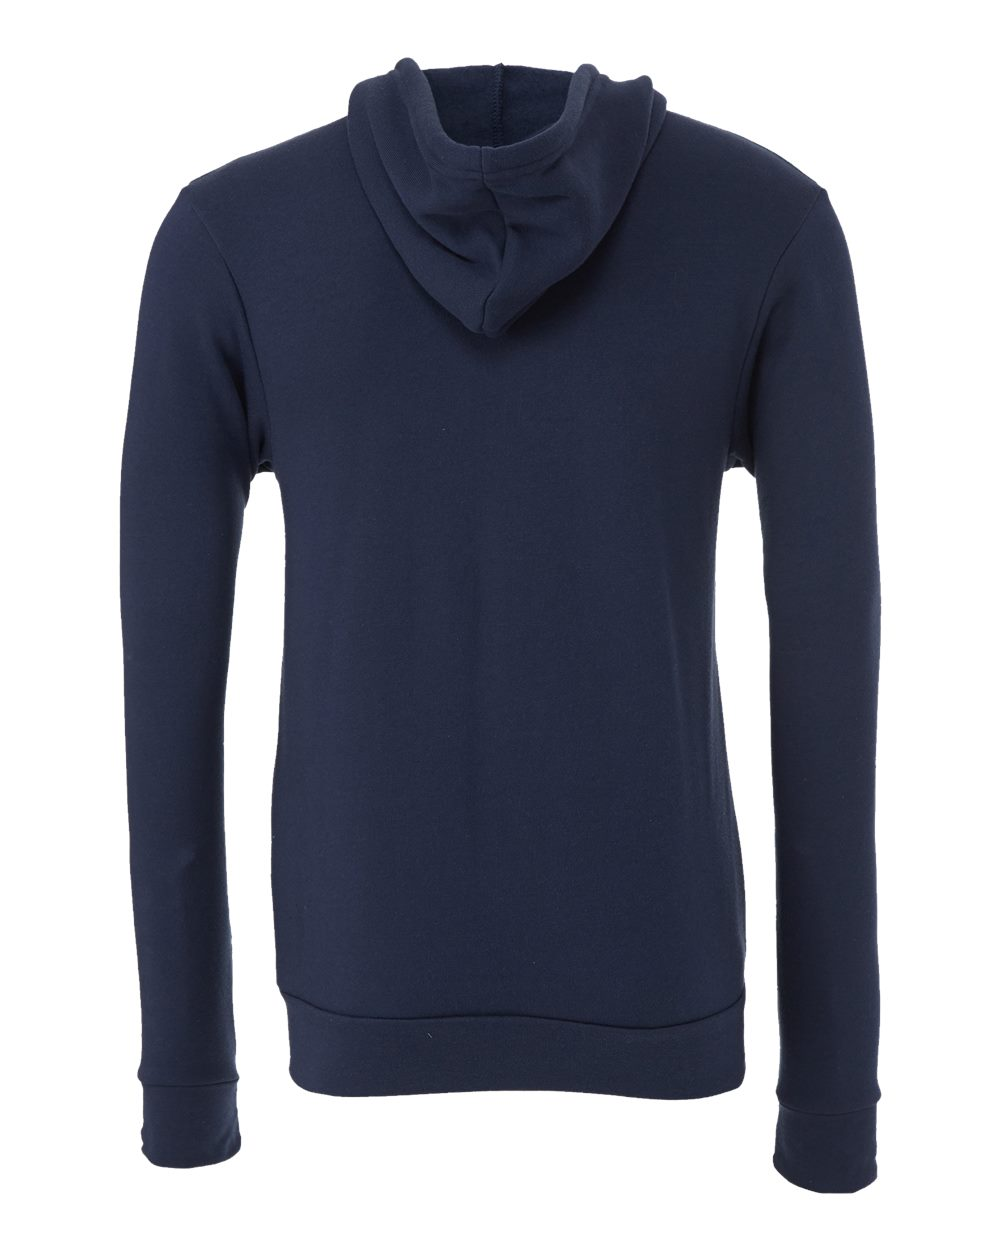 Bella-Canvas-Unisex-Full-Zip-Up-Hooded-Sweatshirt-Blank-Hoodie-3739-up-to-3XL thumbnail 75